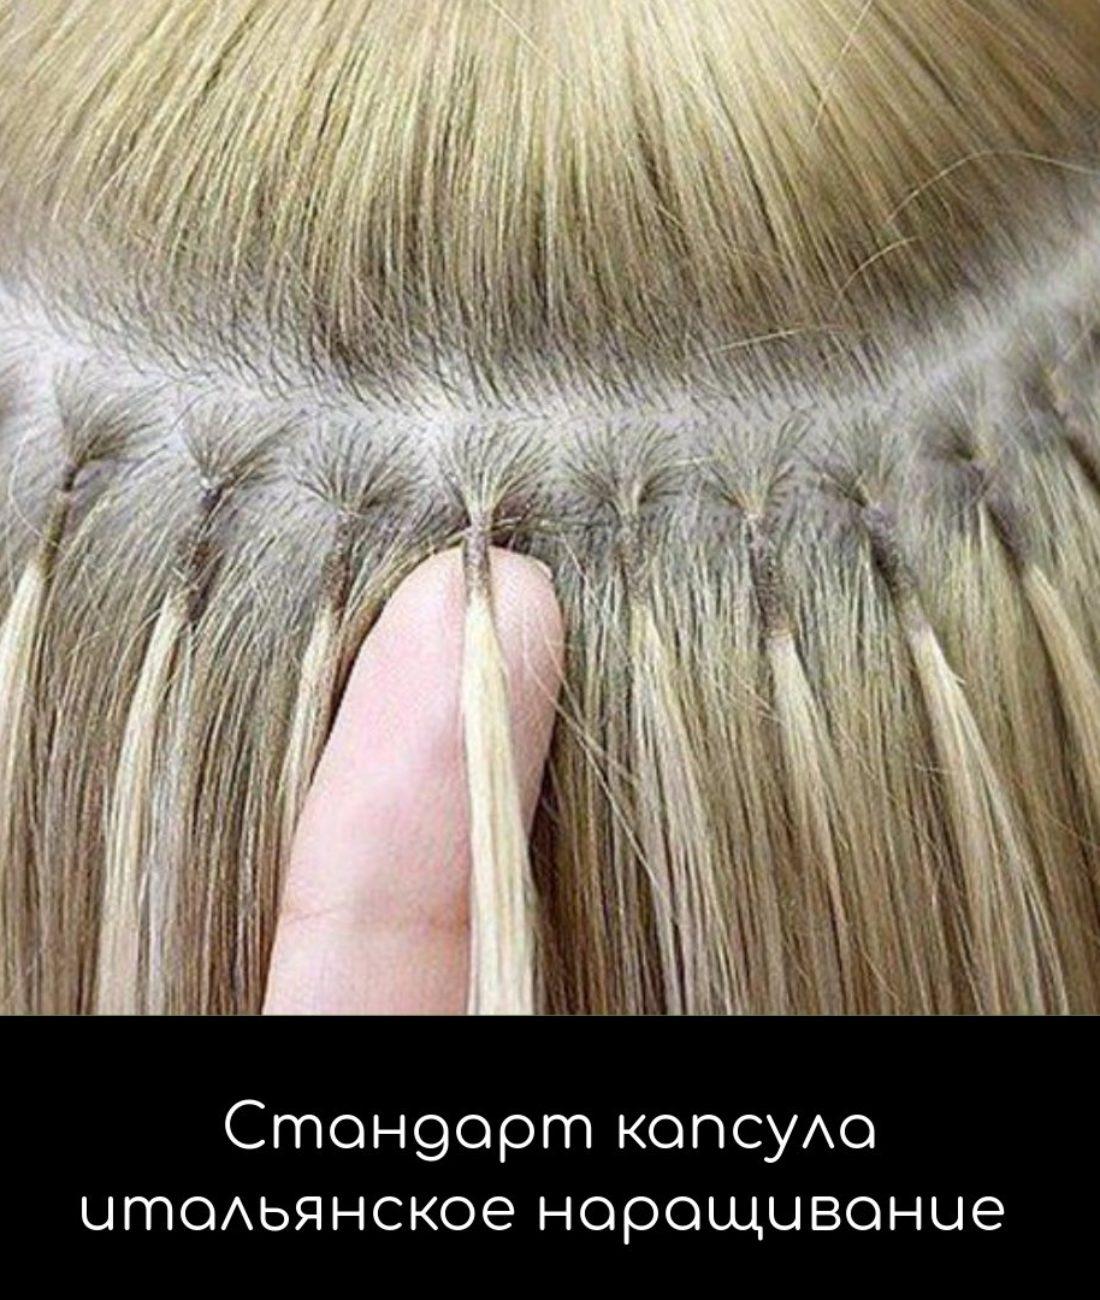 стандартная капсула для наращивания волос